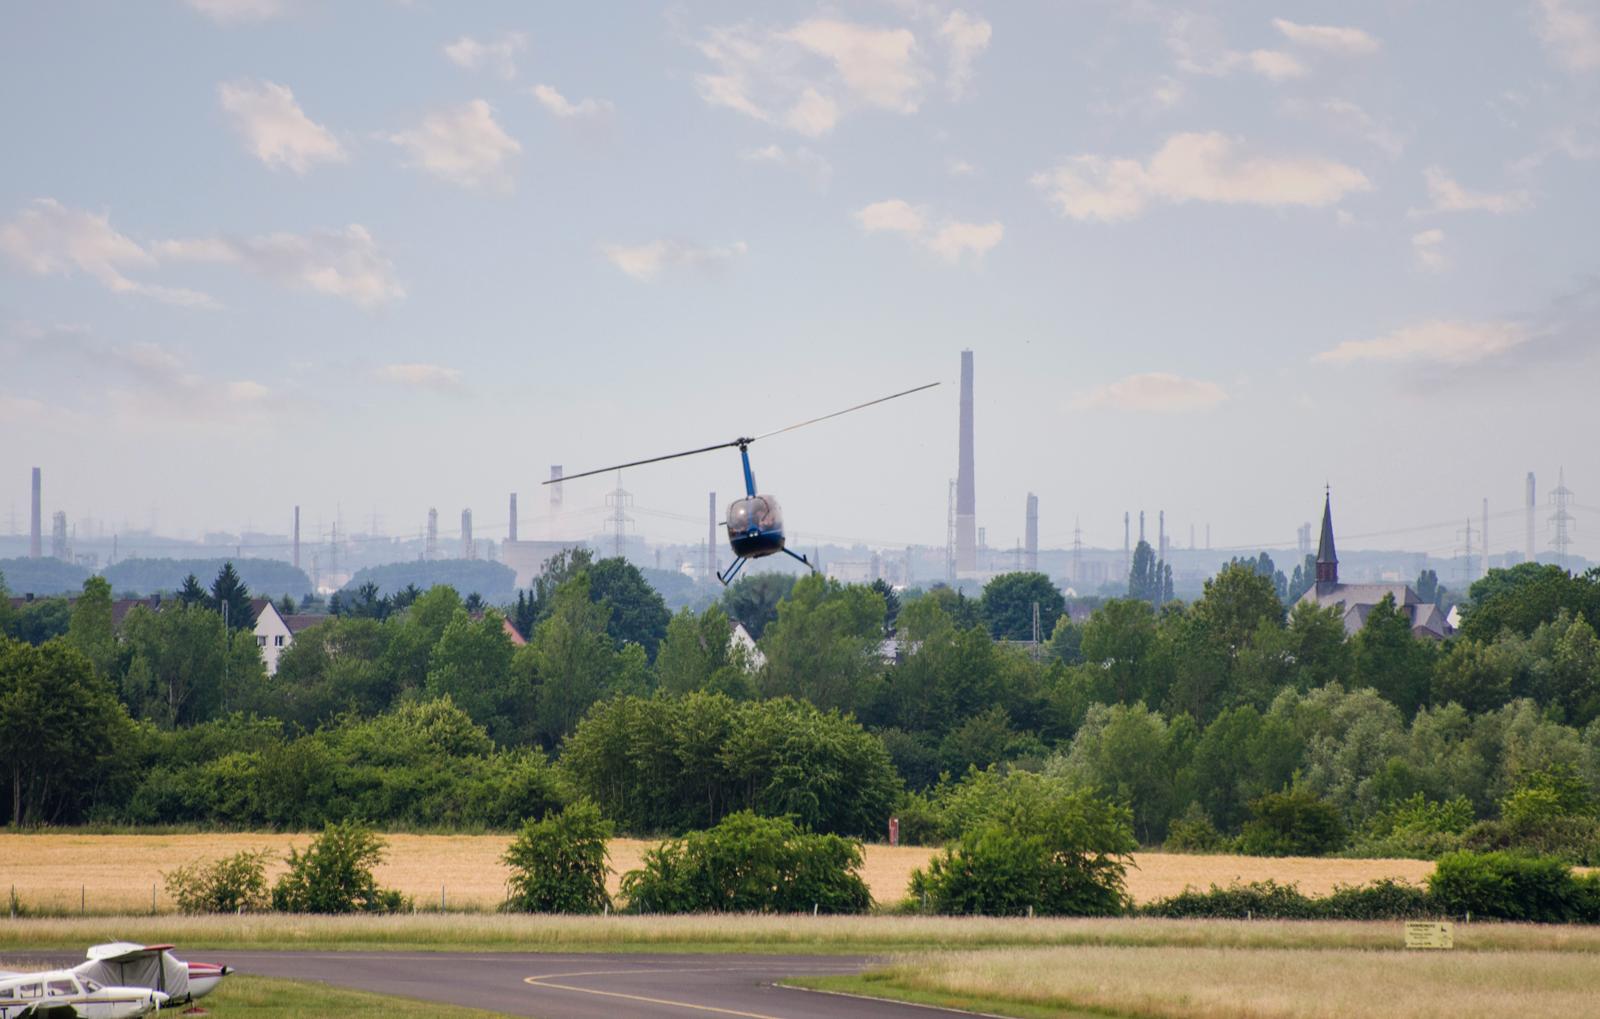 hochzeits-rundflug-grosspoesna-leipzig-bg3